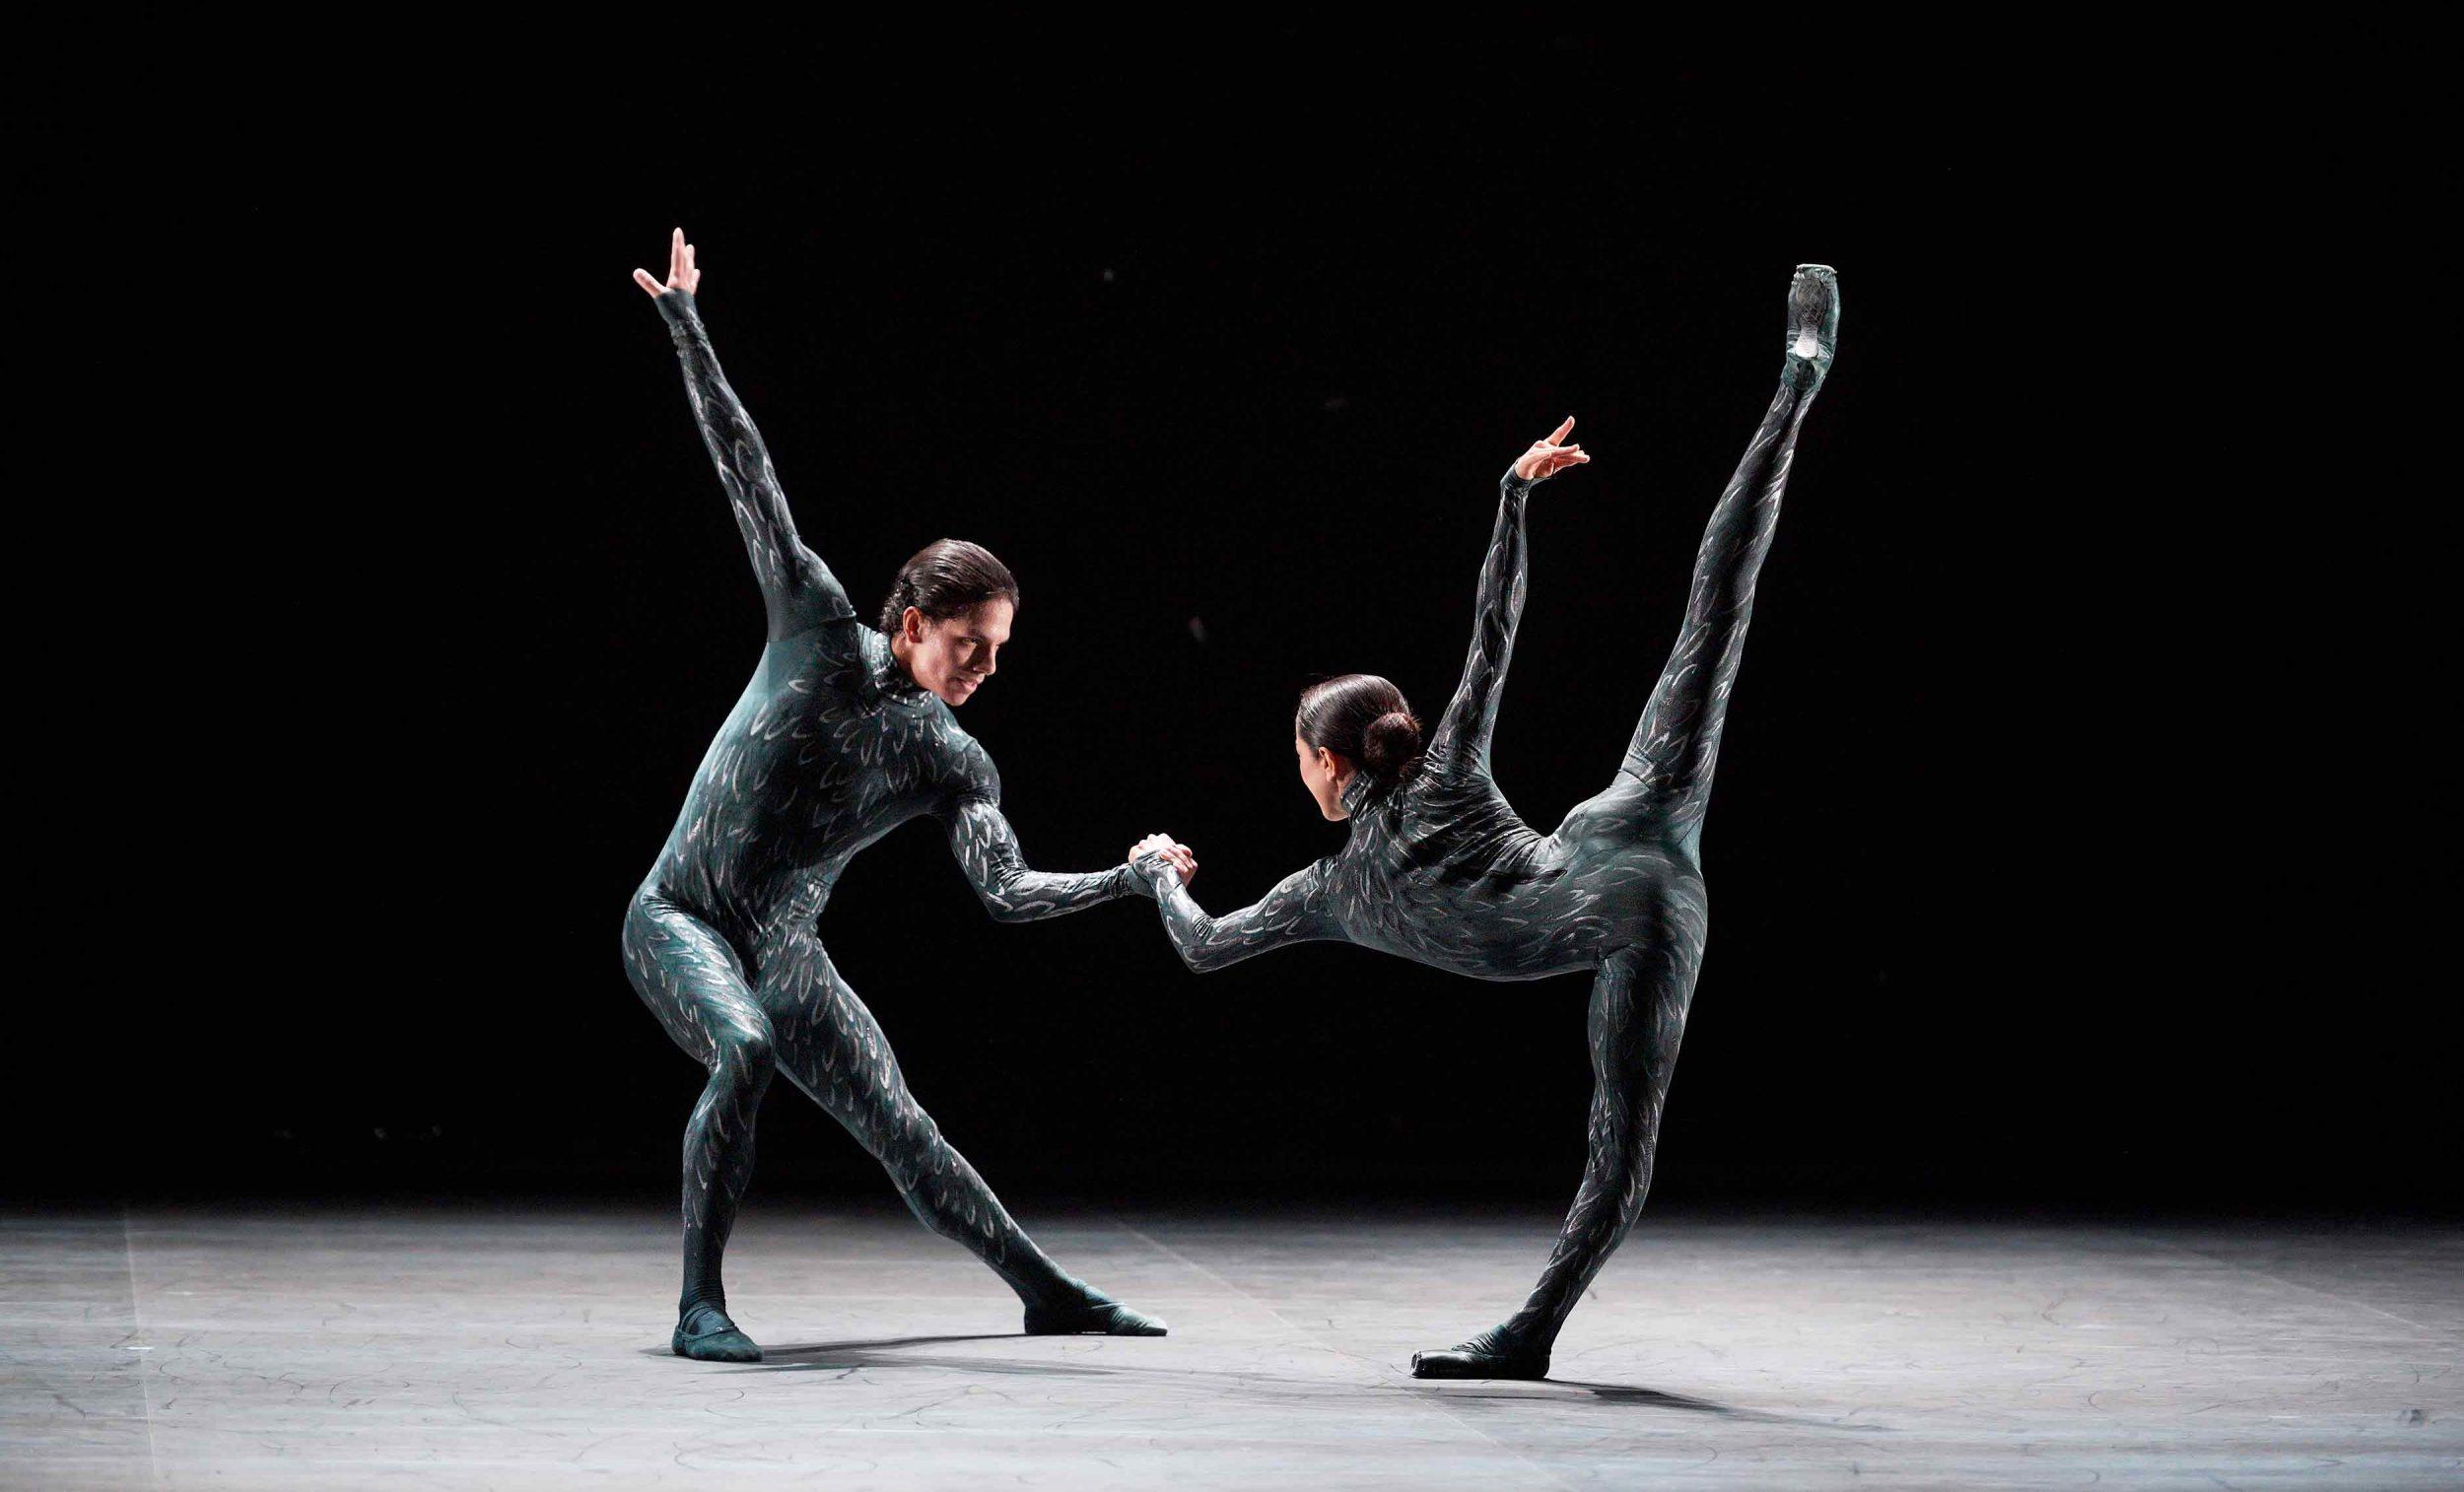 Erina-Takahashi-and-Isaac-Hernandez-in-Fantastic-Beings-by-Aszure-Barton-©-Laurent-Liotardo-(2)